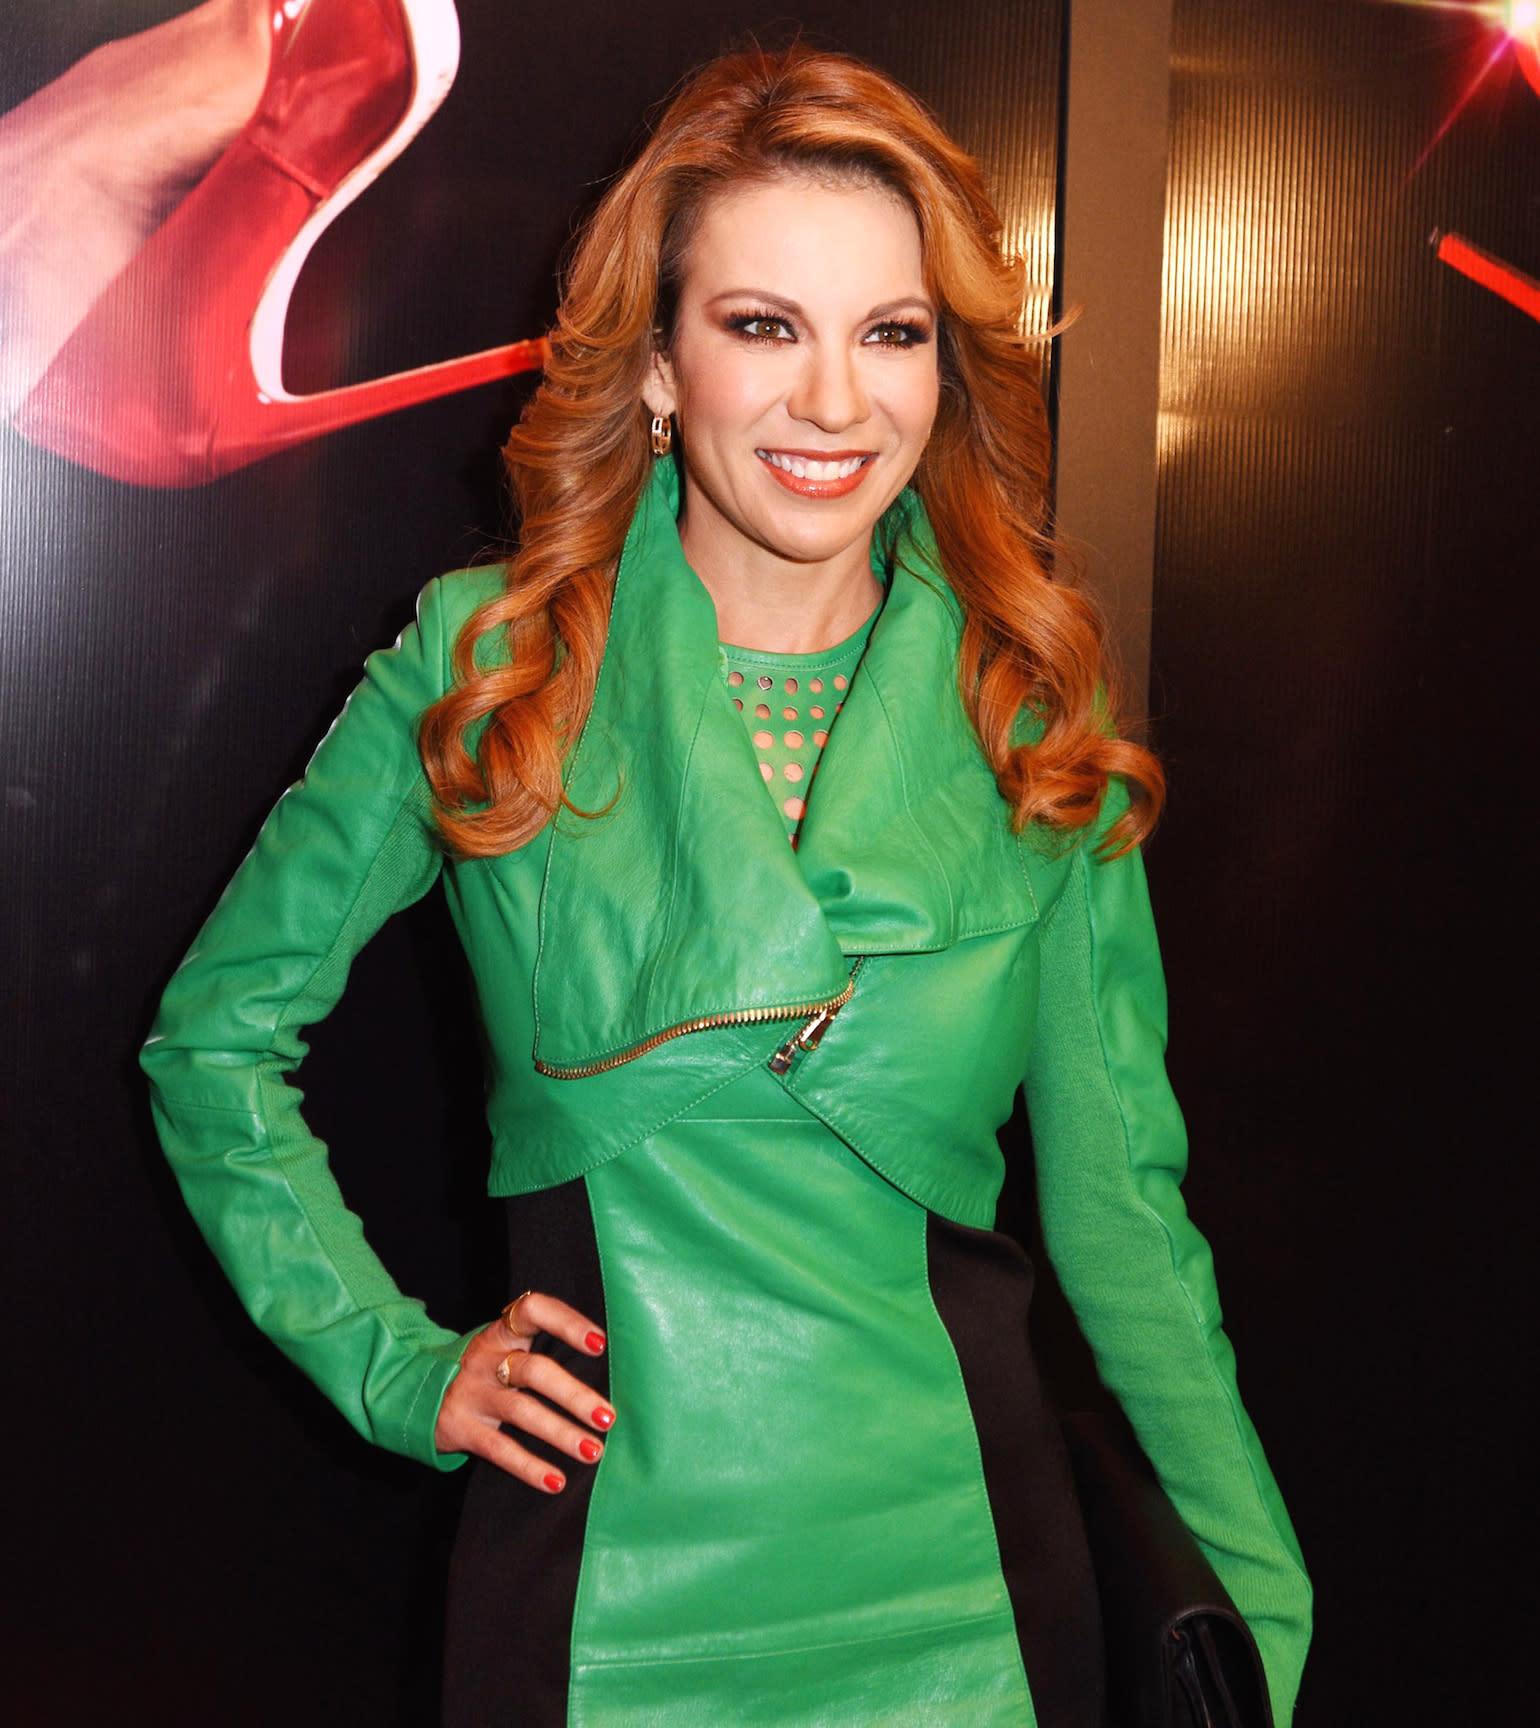 Maria Javier